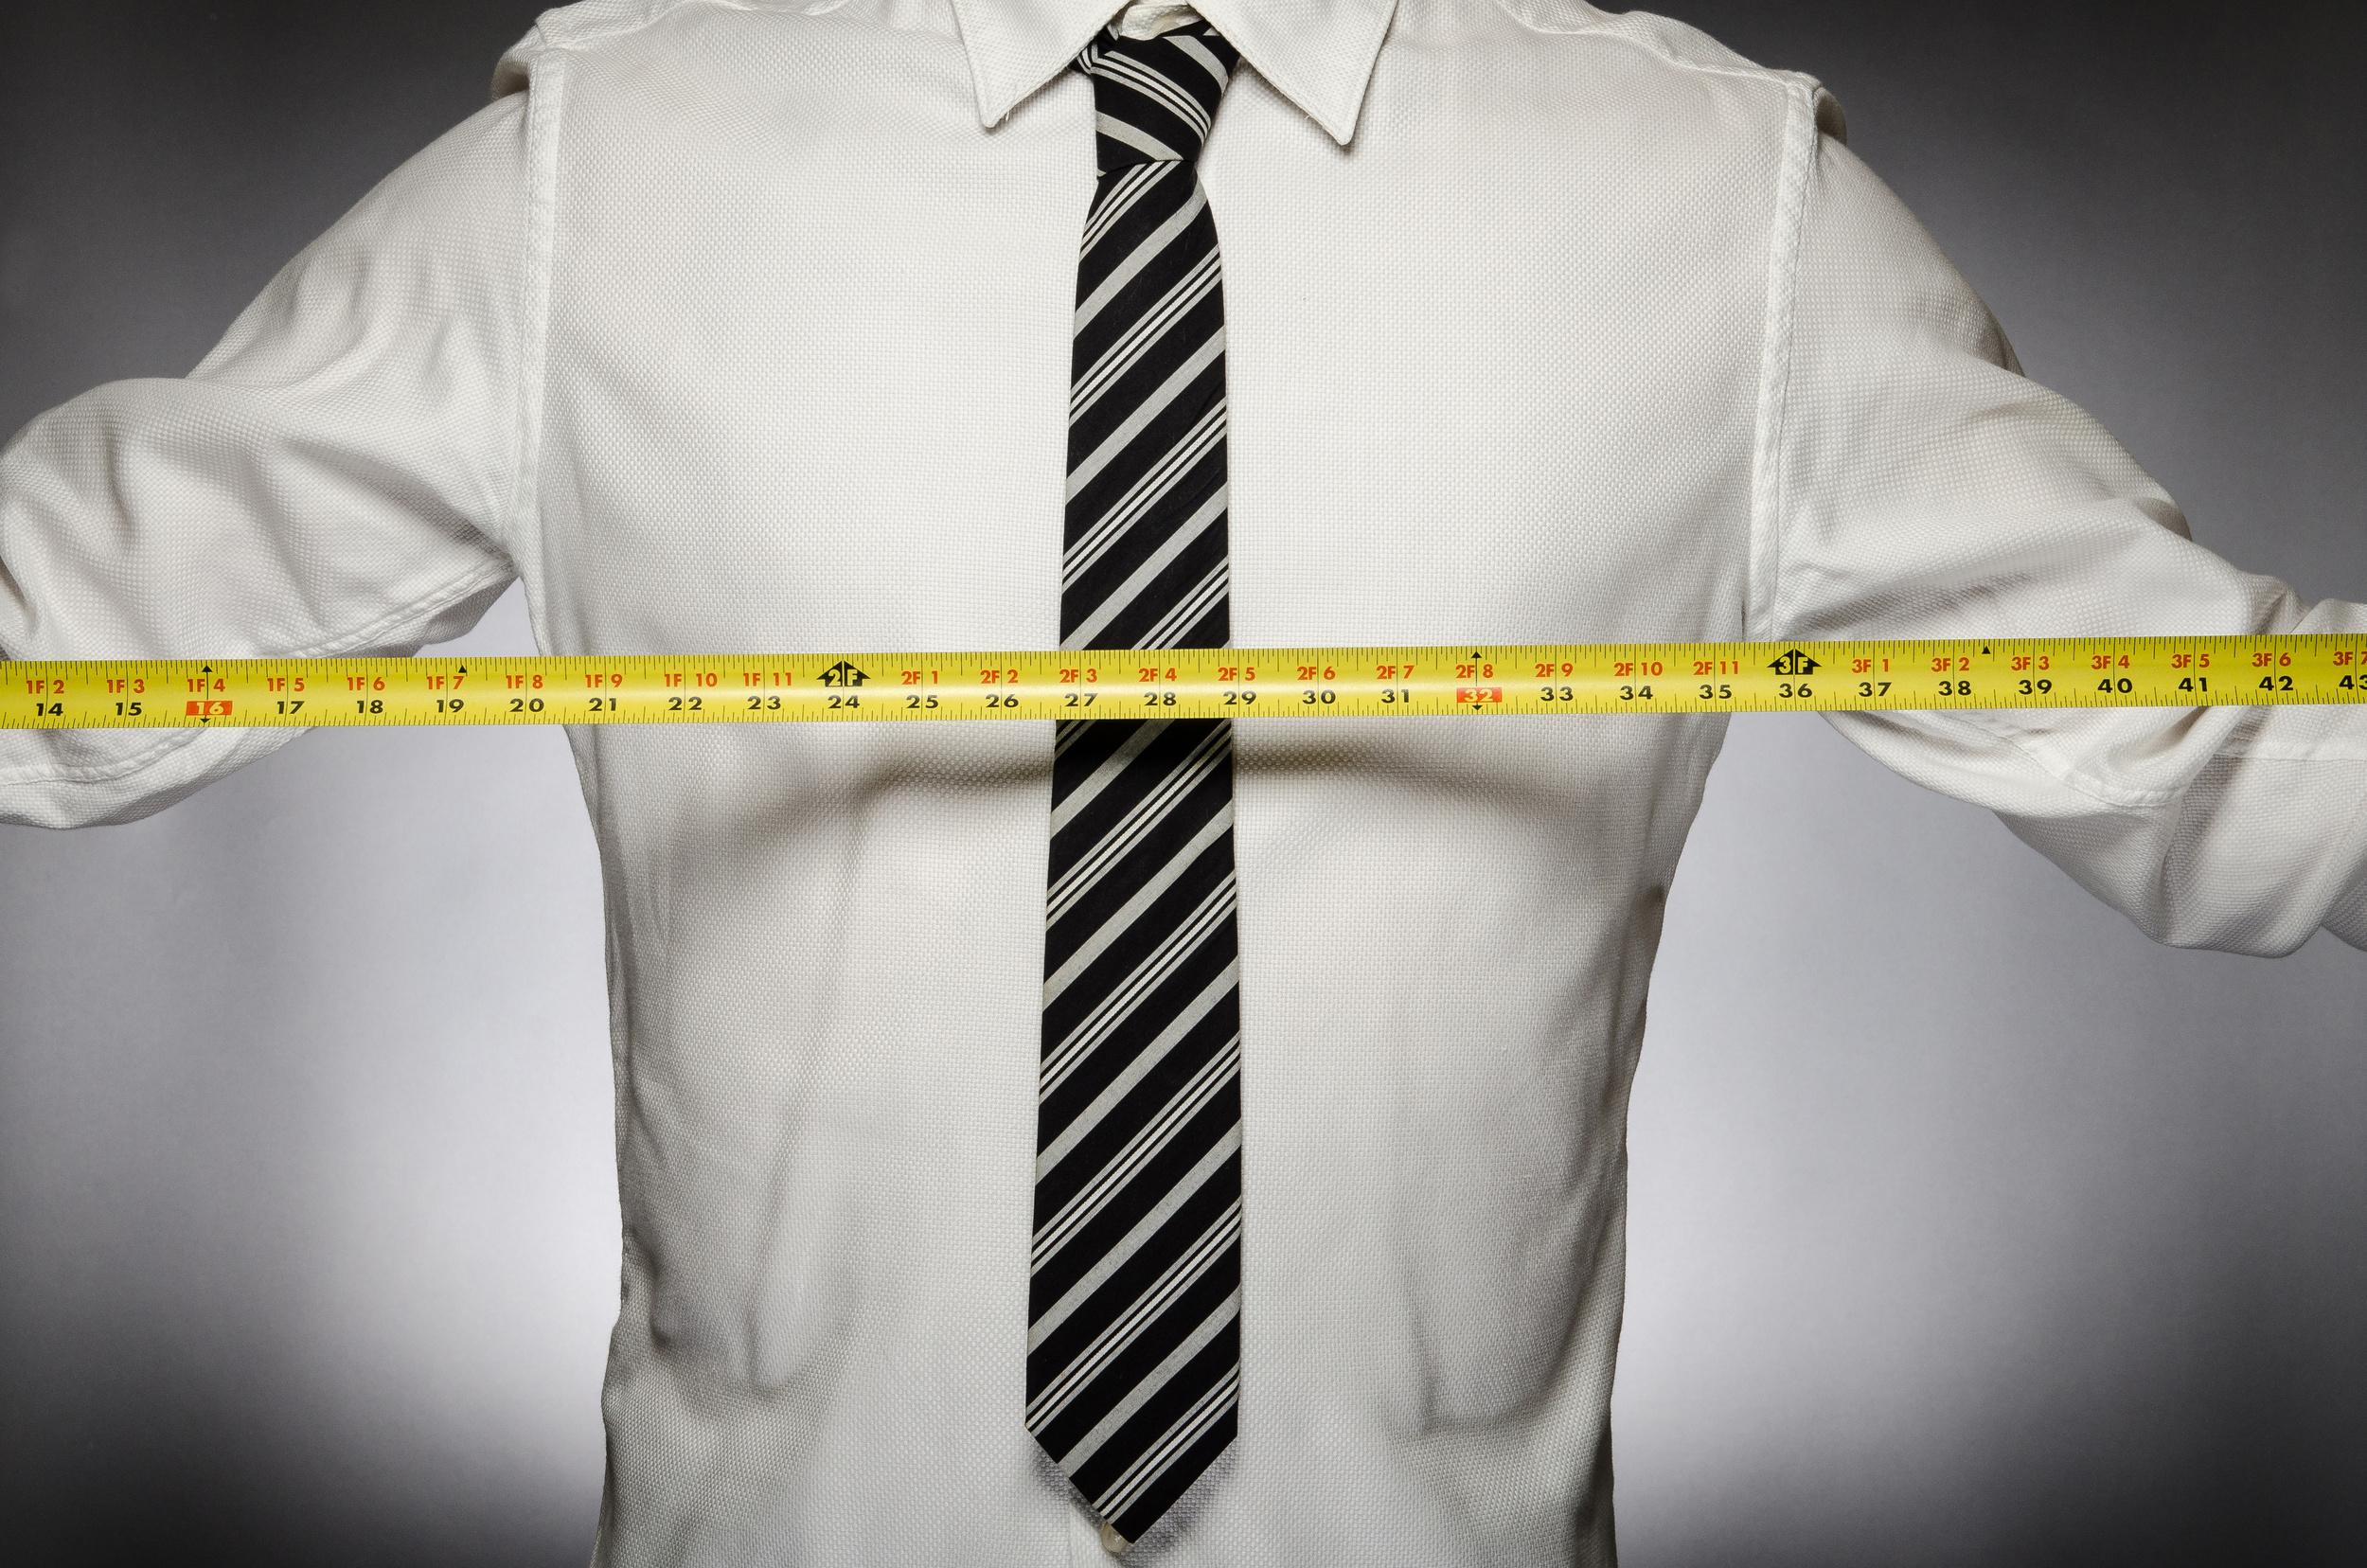 Man wearing tie holding tape measure